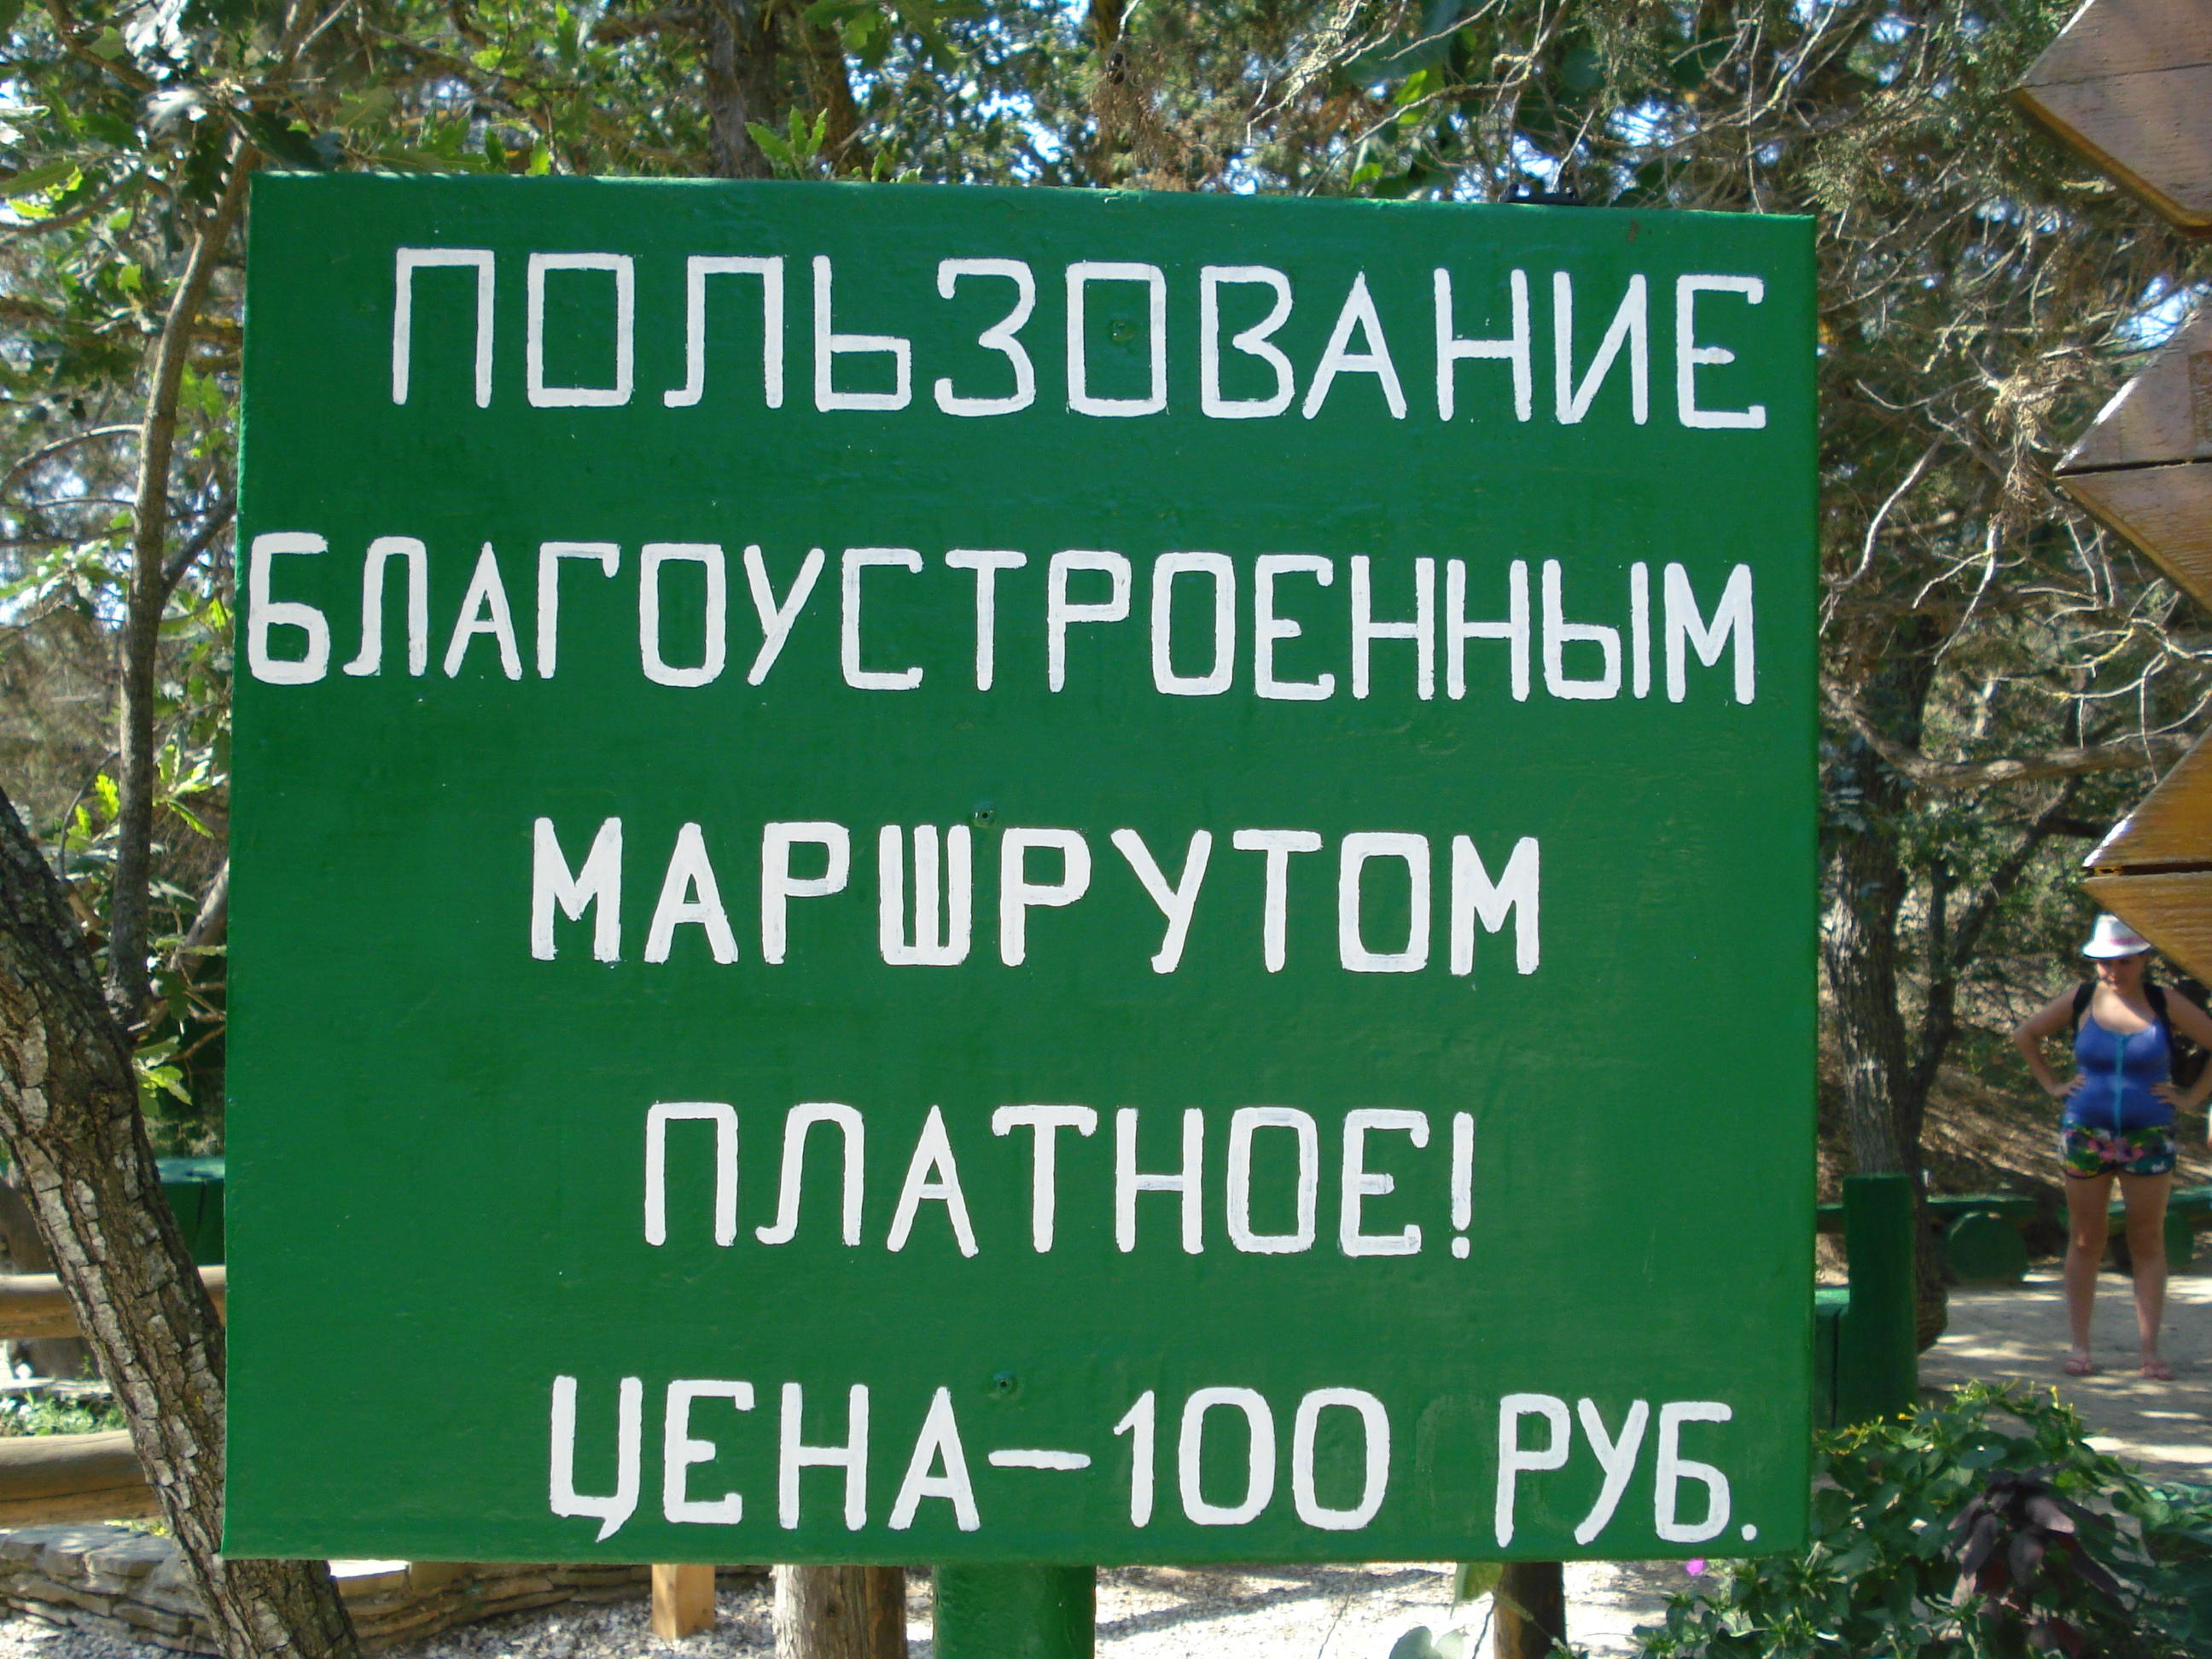 https://img-fotki.yandex.ru/get/103922/38146243.1e/0_d1da8_d1d416c1_orig.jpg